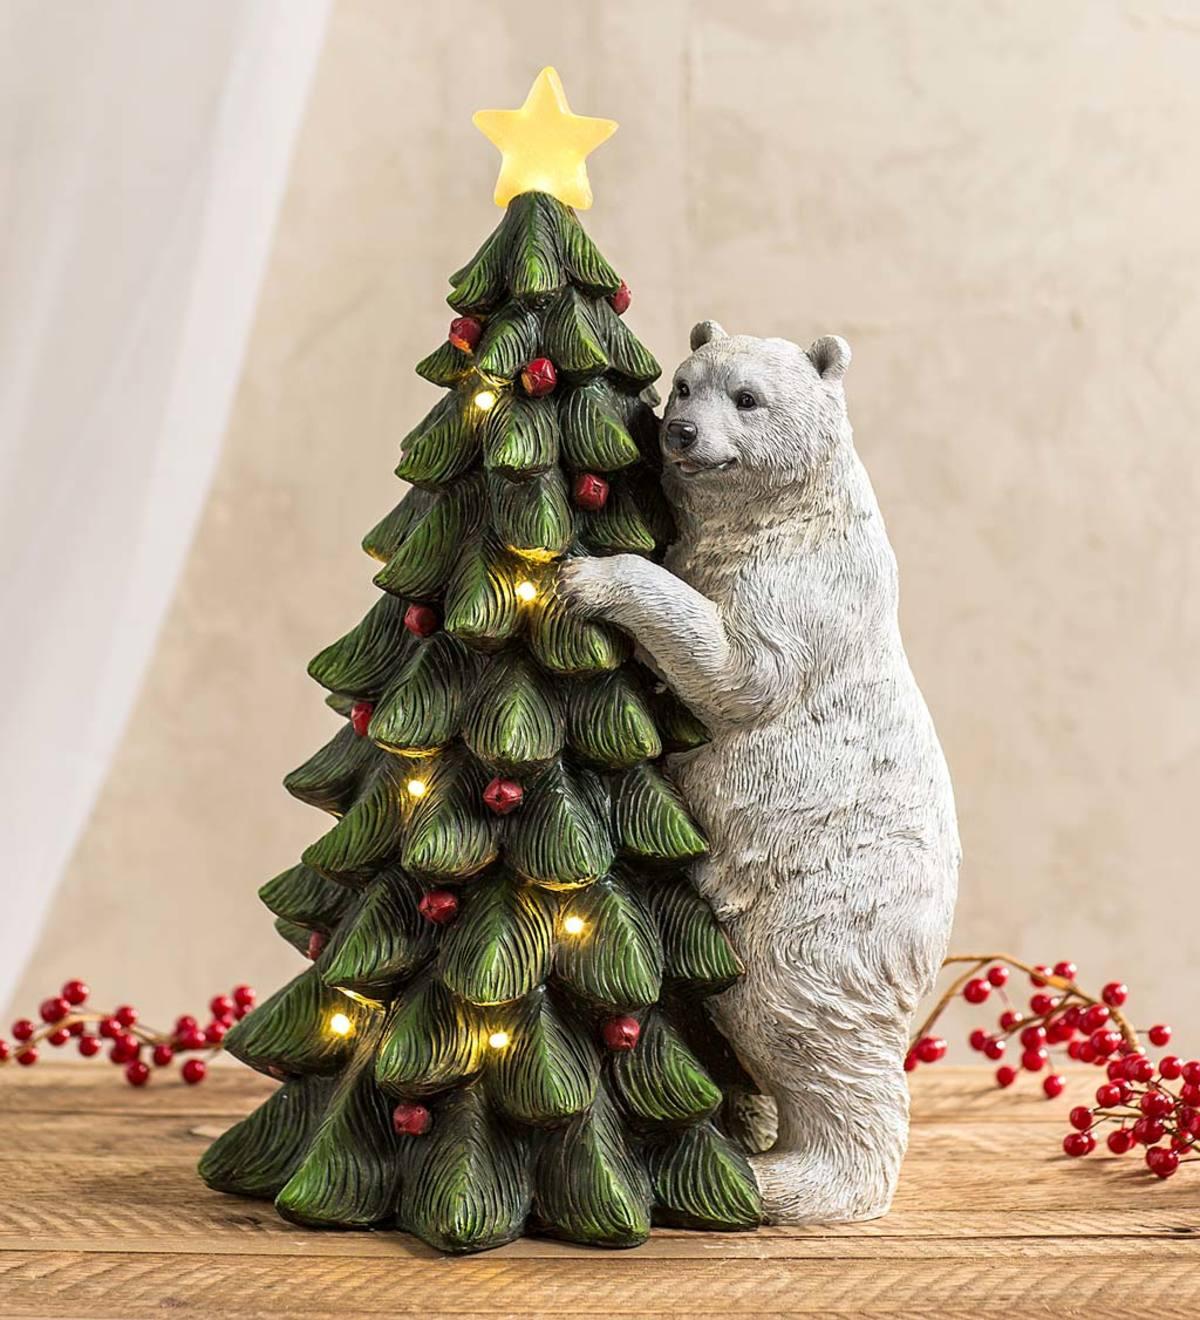 Polar Bear with Christmas Tree Lighted Holiday Statue ...